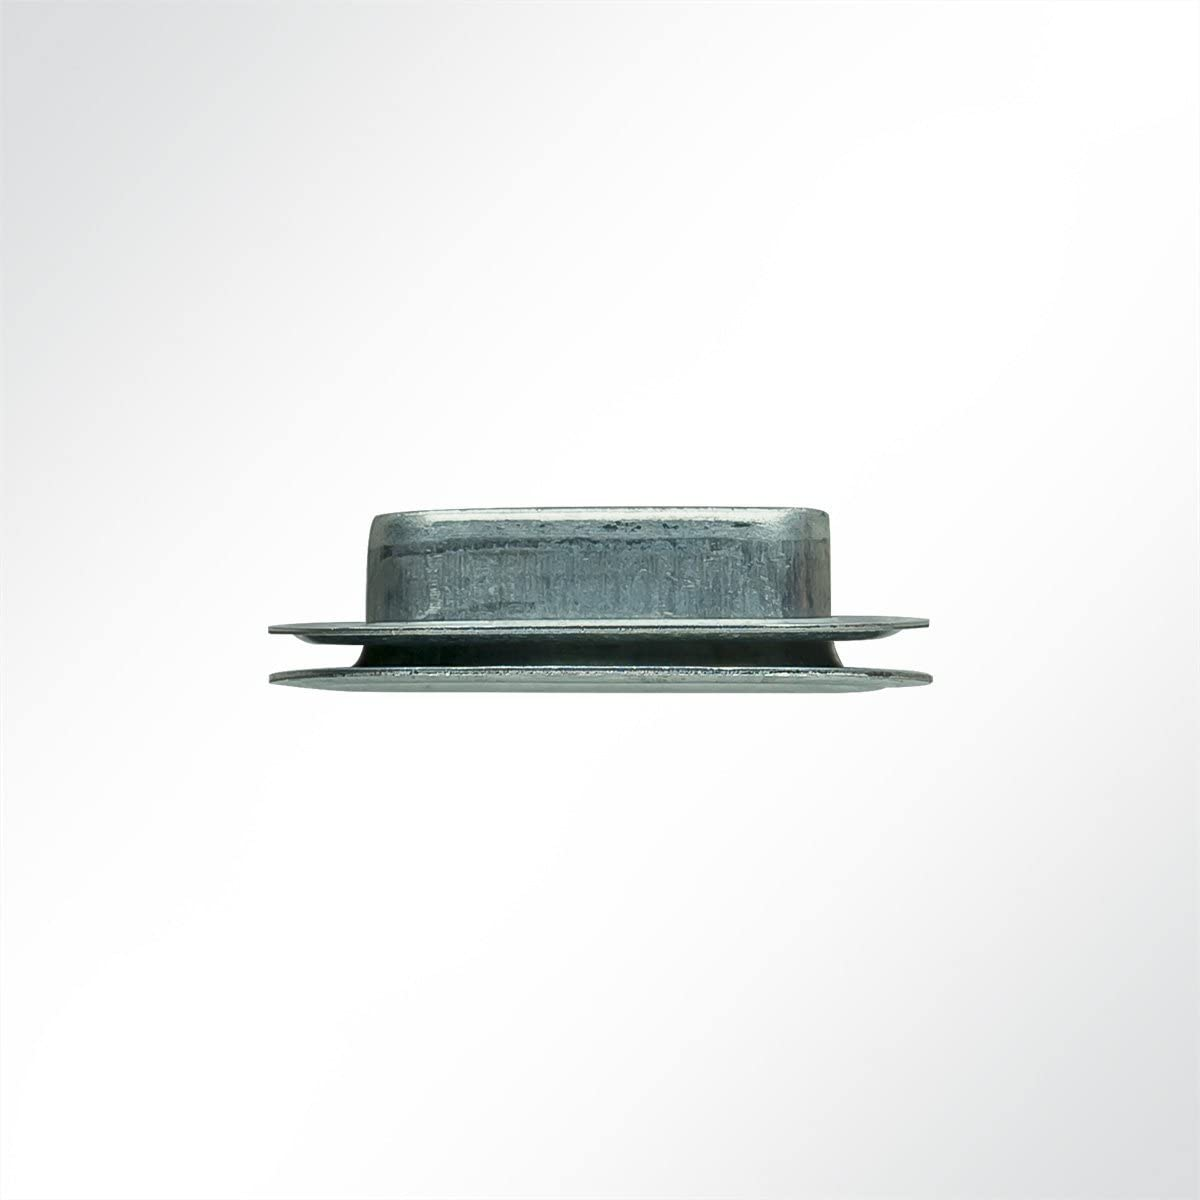 BxL 1 St/ück LYSEL/® Oval/öse 27x8 mm, 8x27mm in grau